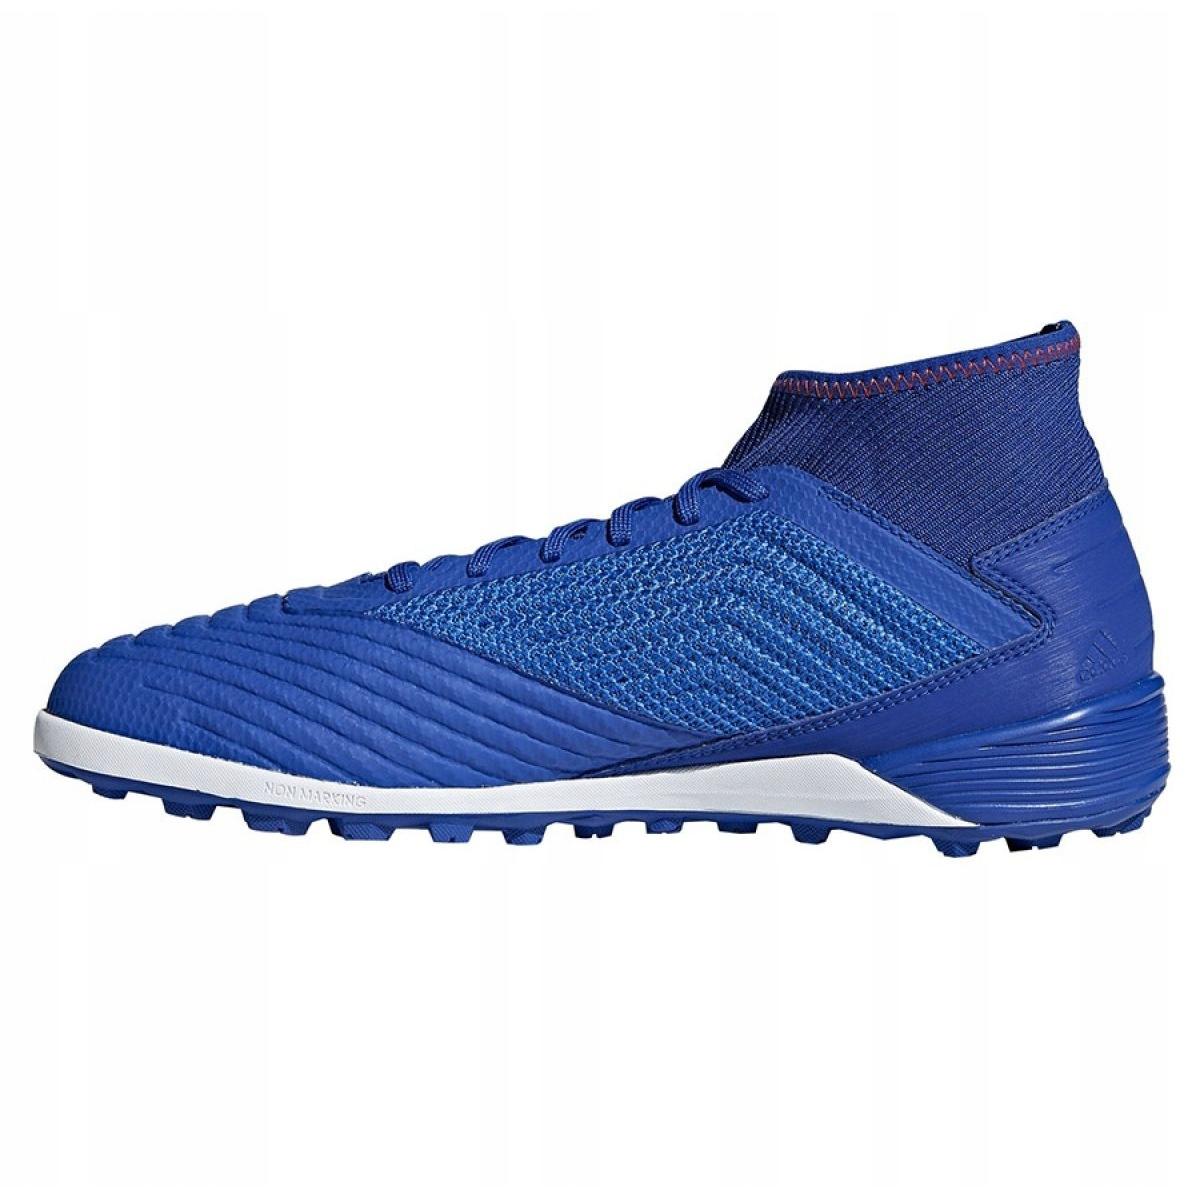 Chuteiras de futebol adidas Predator 19.3 Tf M BB9084 azul azul